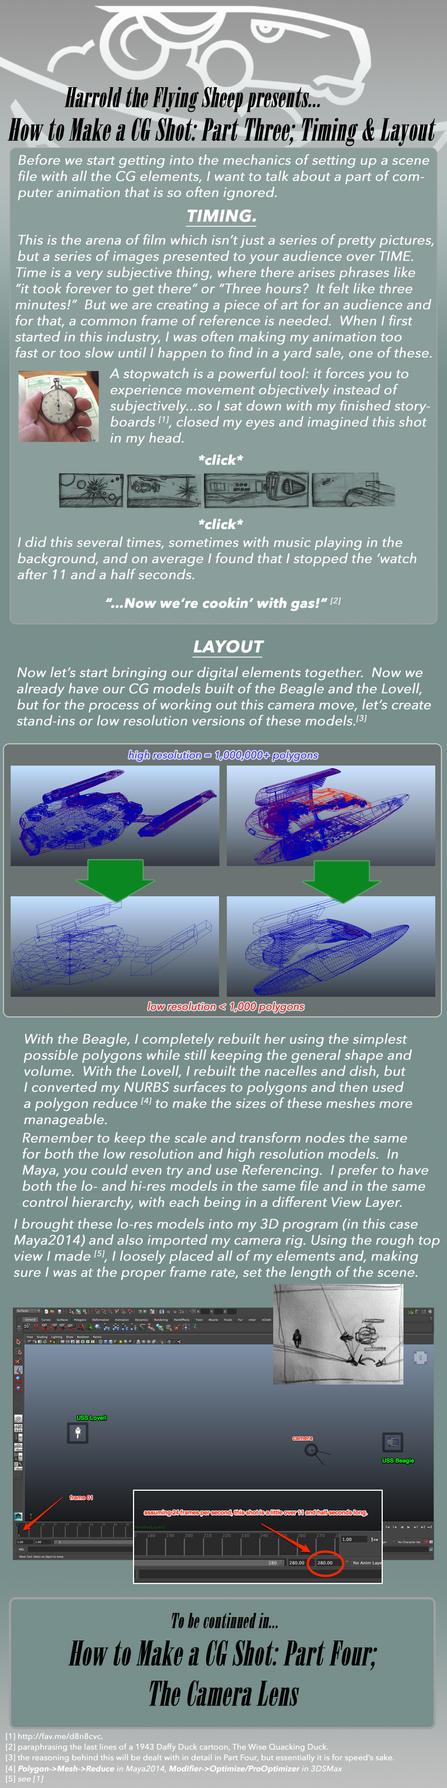 How to Make a CG Shot: Part 3, Timing+Layout by harroldsheep